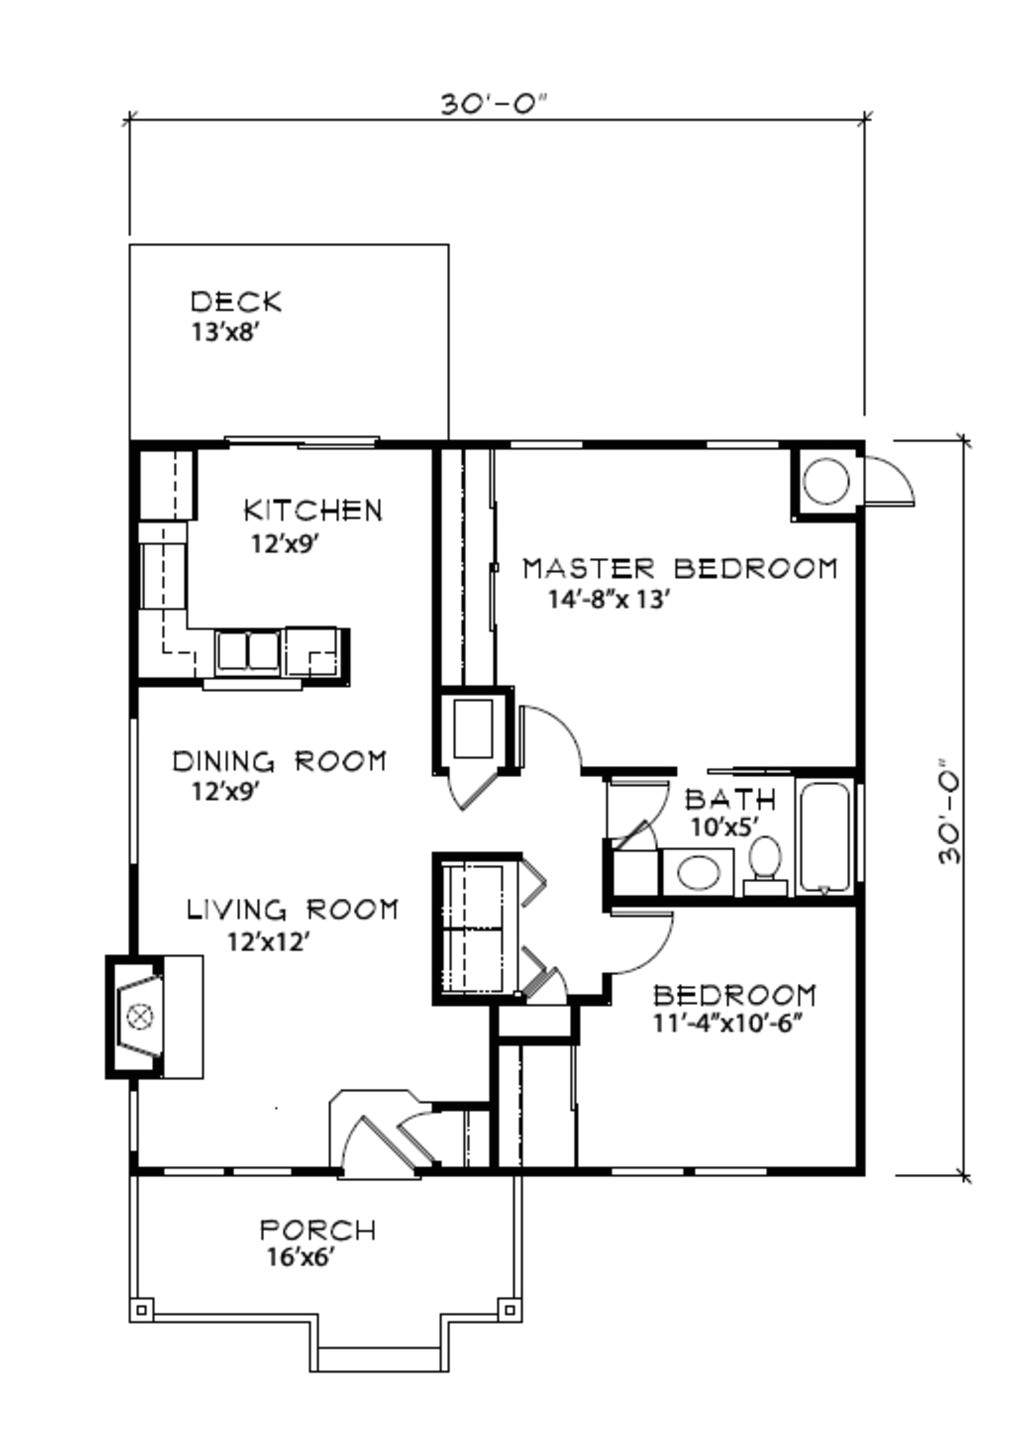 900 square feet 2 bedrooms 1 bathroom farm house plans 0 garage 36977